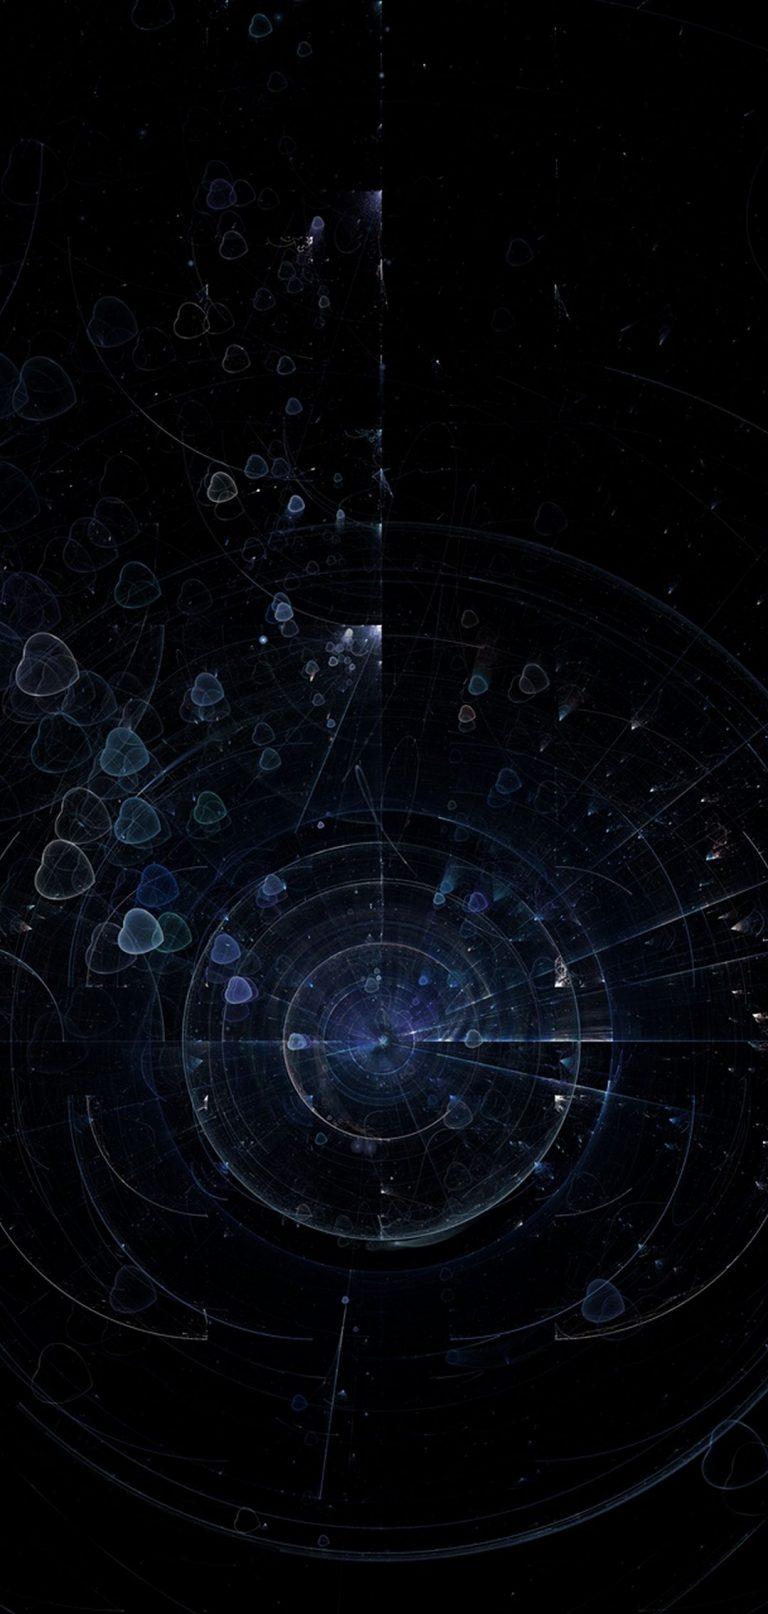 Fractal Circles Hearts 1080x2270 768x1614